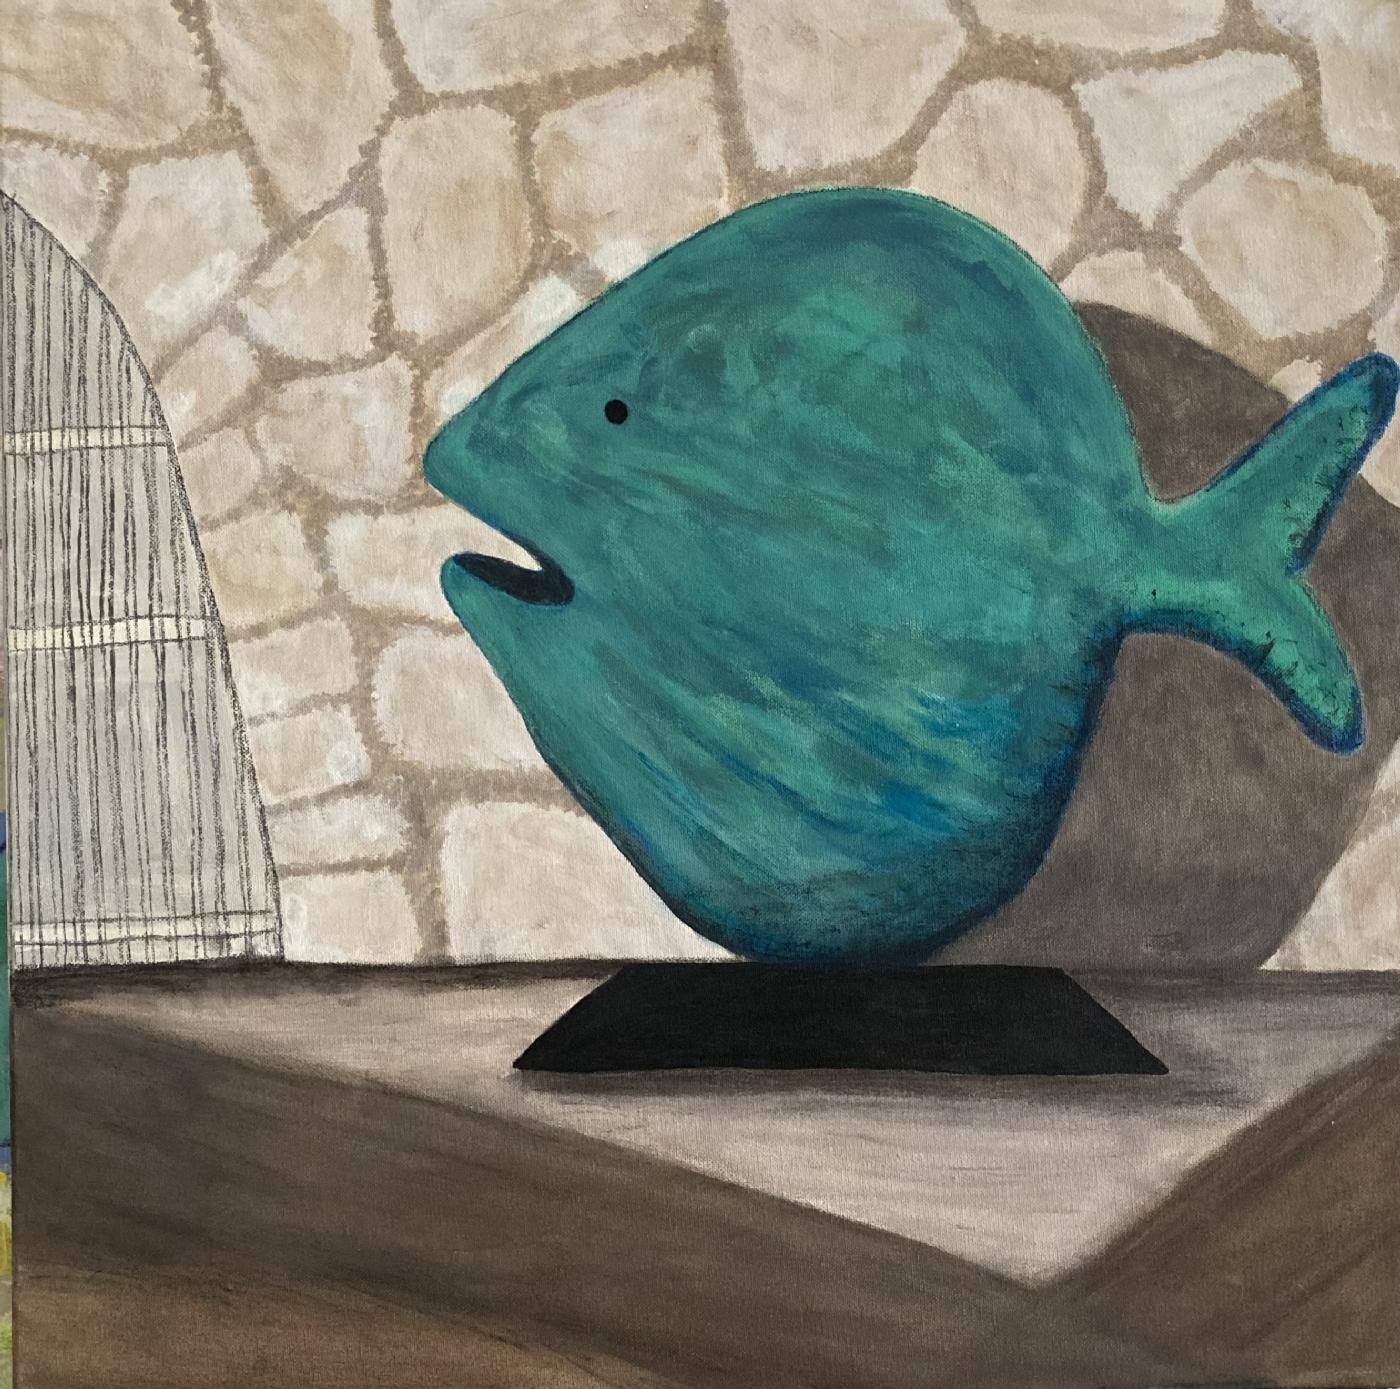 'It's rather fishy' | Maleri